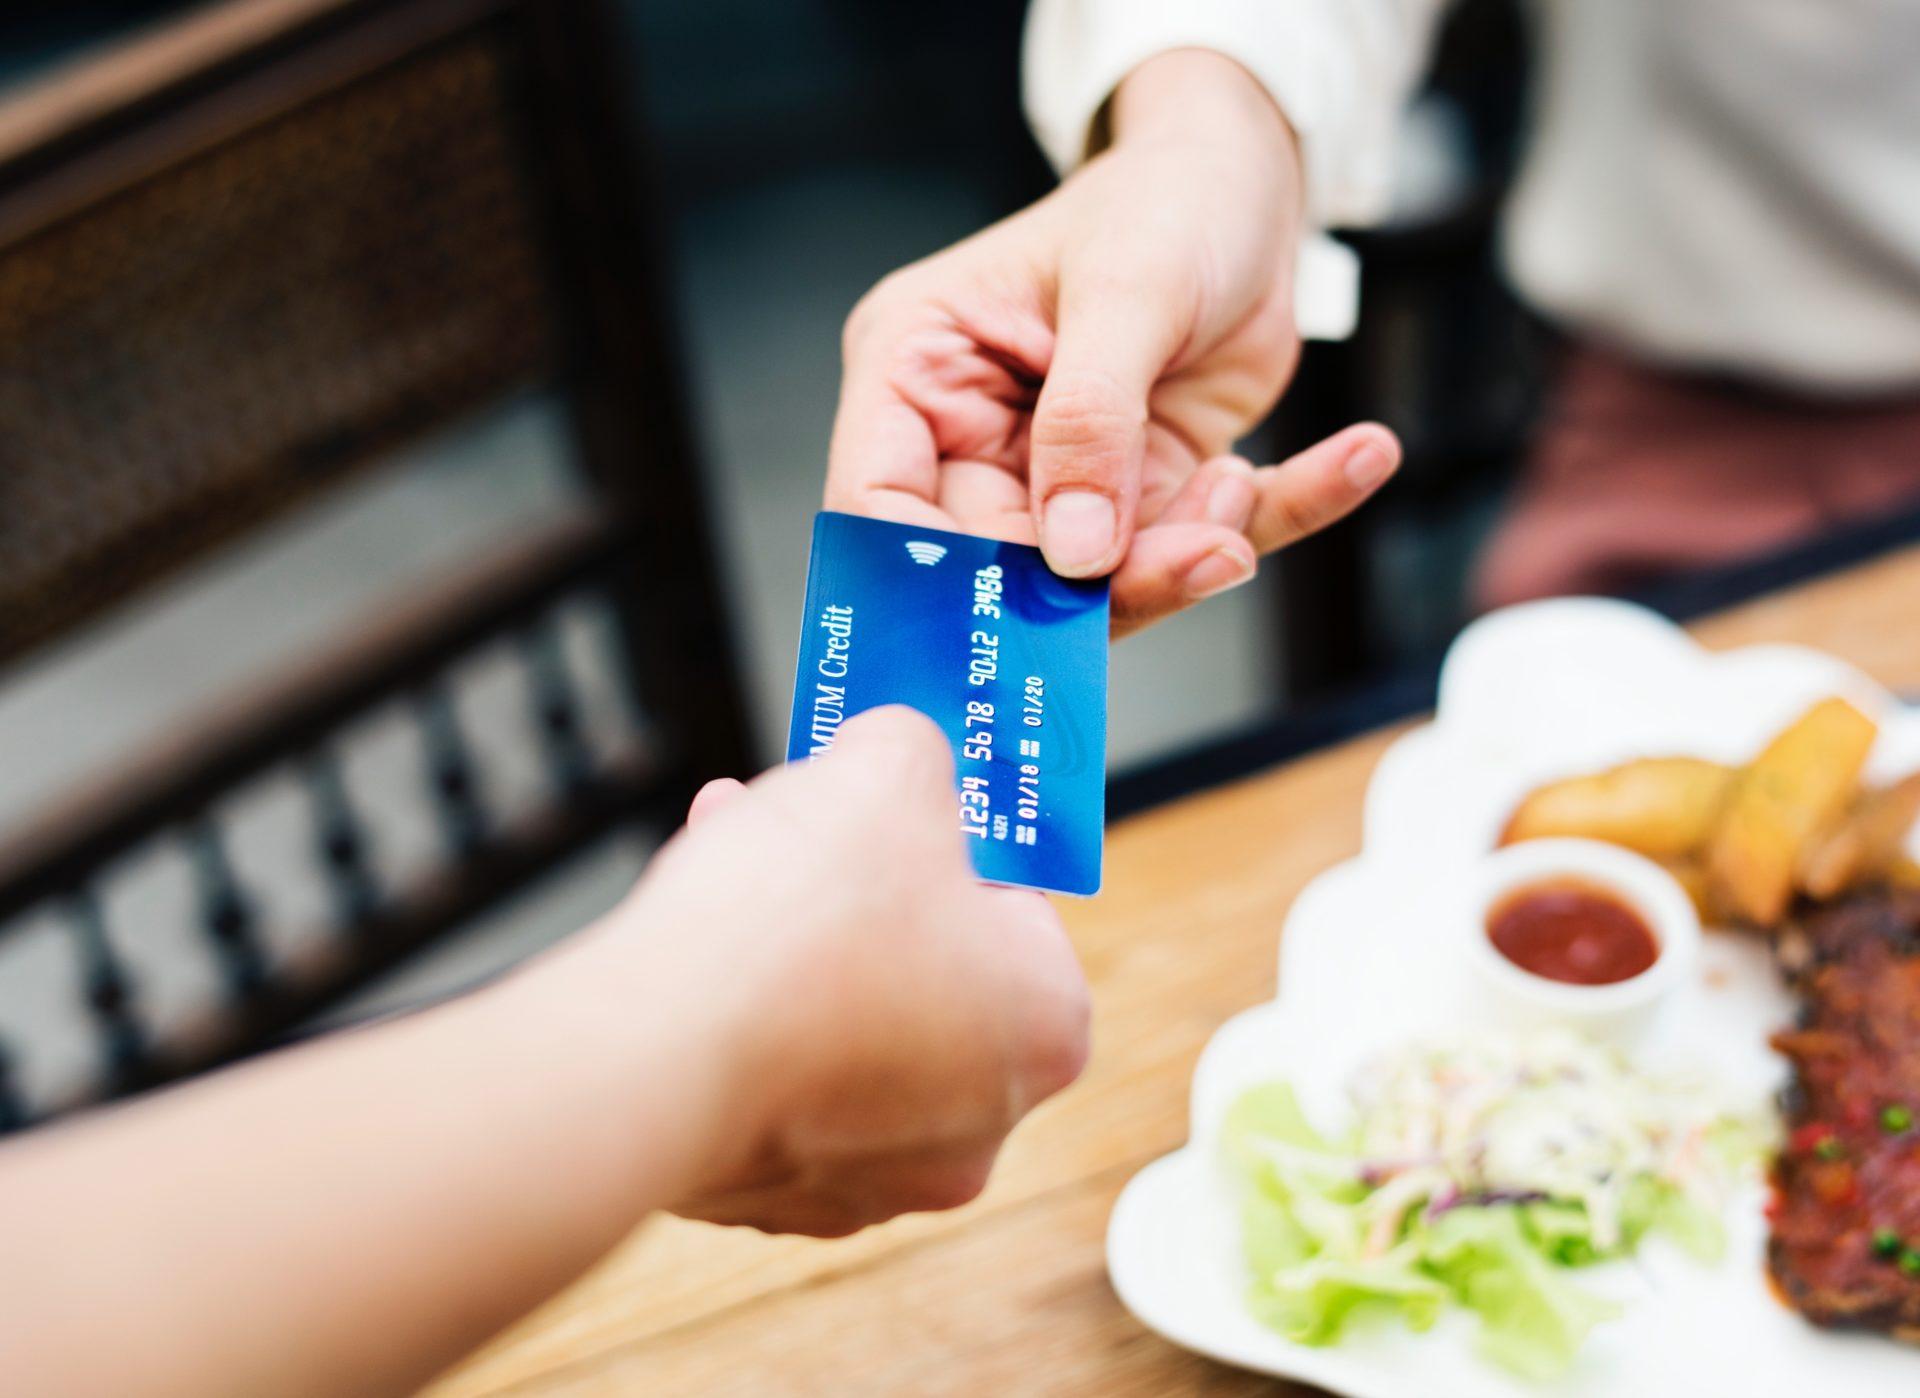 Bitcoin (BTC) Millionaire Finman Likens Lightning Network To Visa & Mastercard 13